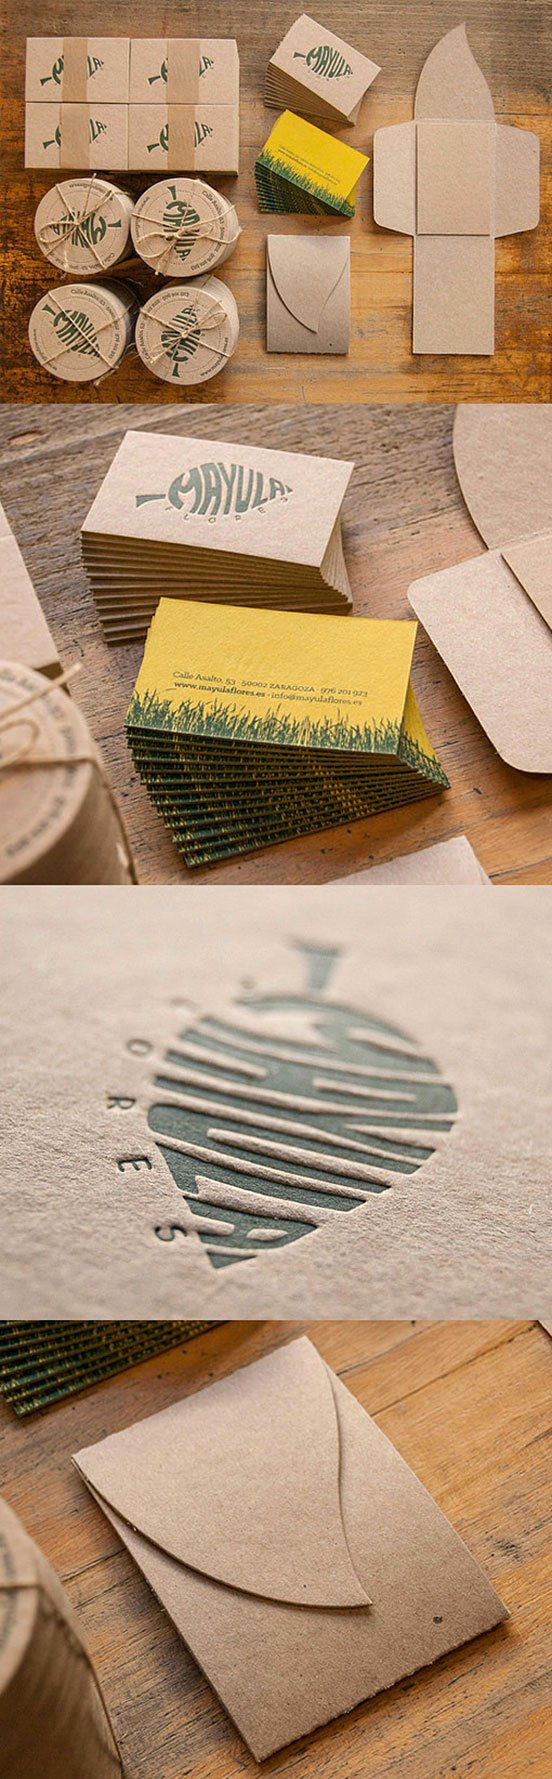 Leaf Shaped Business Cards Lovely Leaf themed Letterpress Business Cards Business Cards